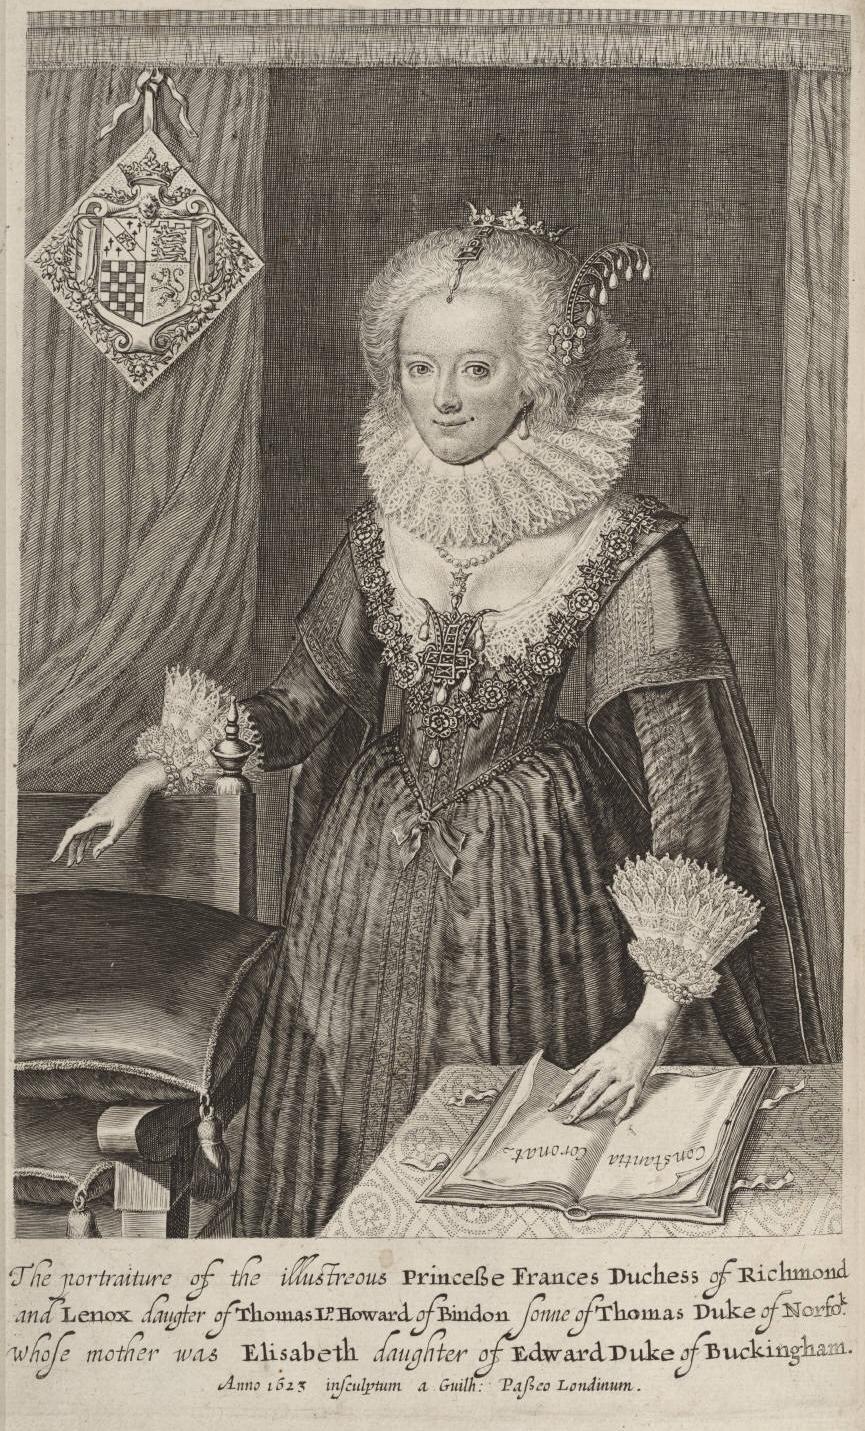 Frances, Duchess of Richmond and Lennox